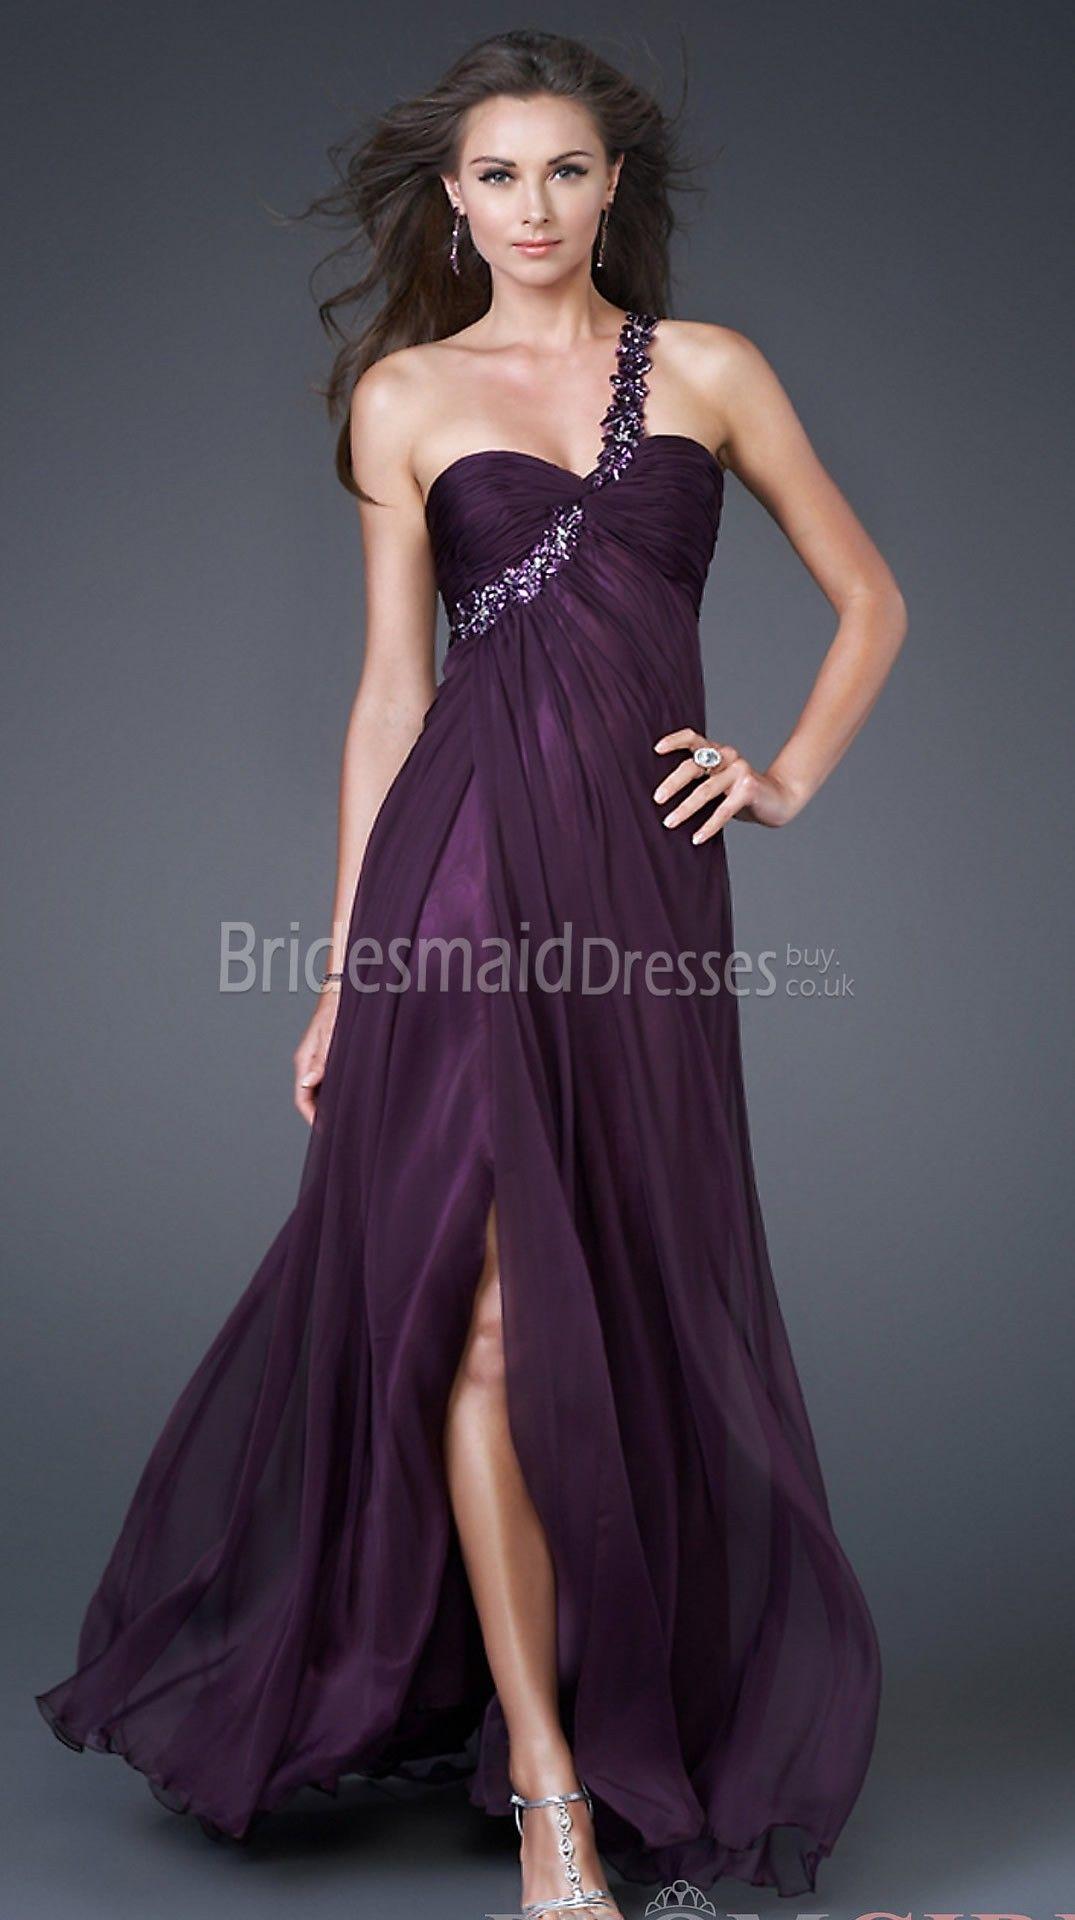 Grape Velvet Chiffon A Line One Shoulder Bridesmaid Dresses Ukjt03 038 Bridesmaiddresses Co Uk